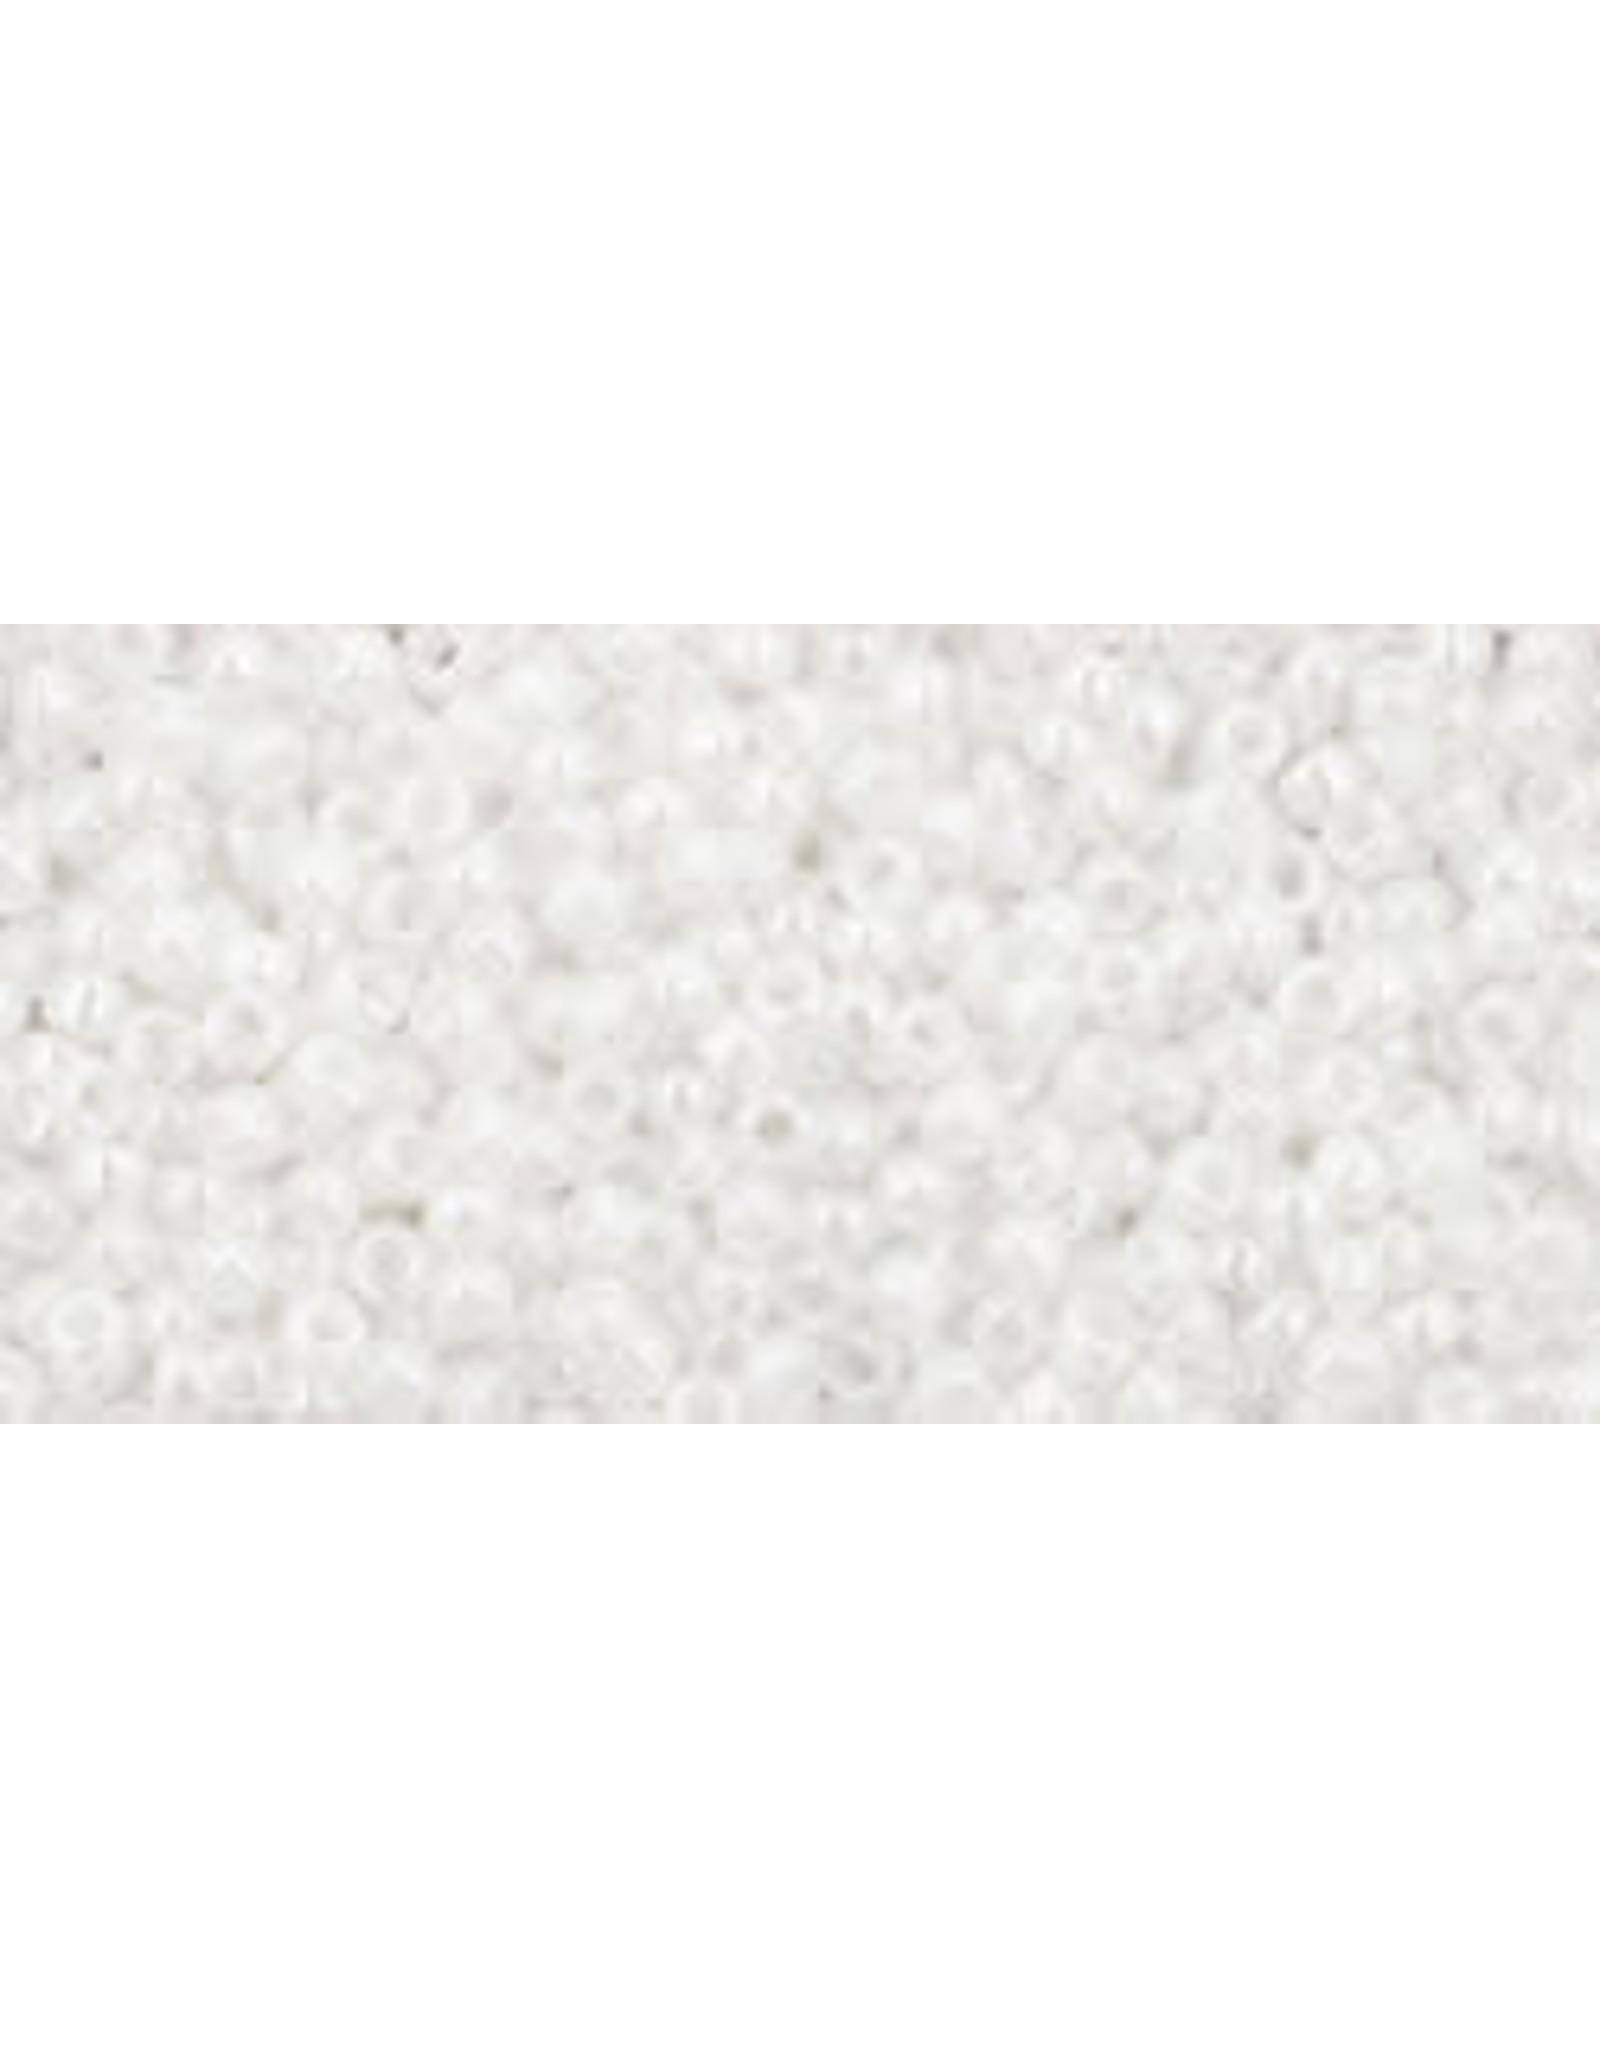 Toho 121 15  Seed 6g  Opaque White Lustre